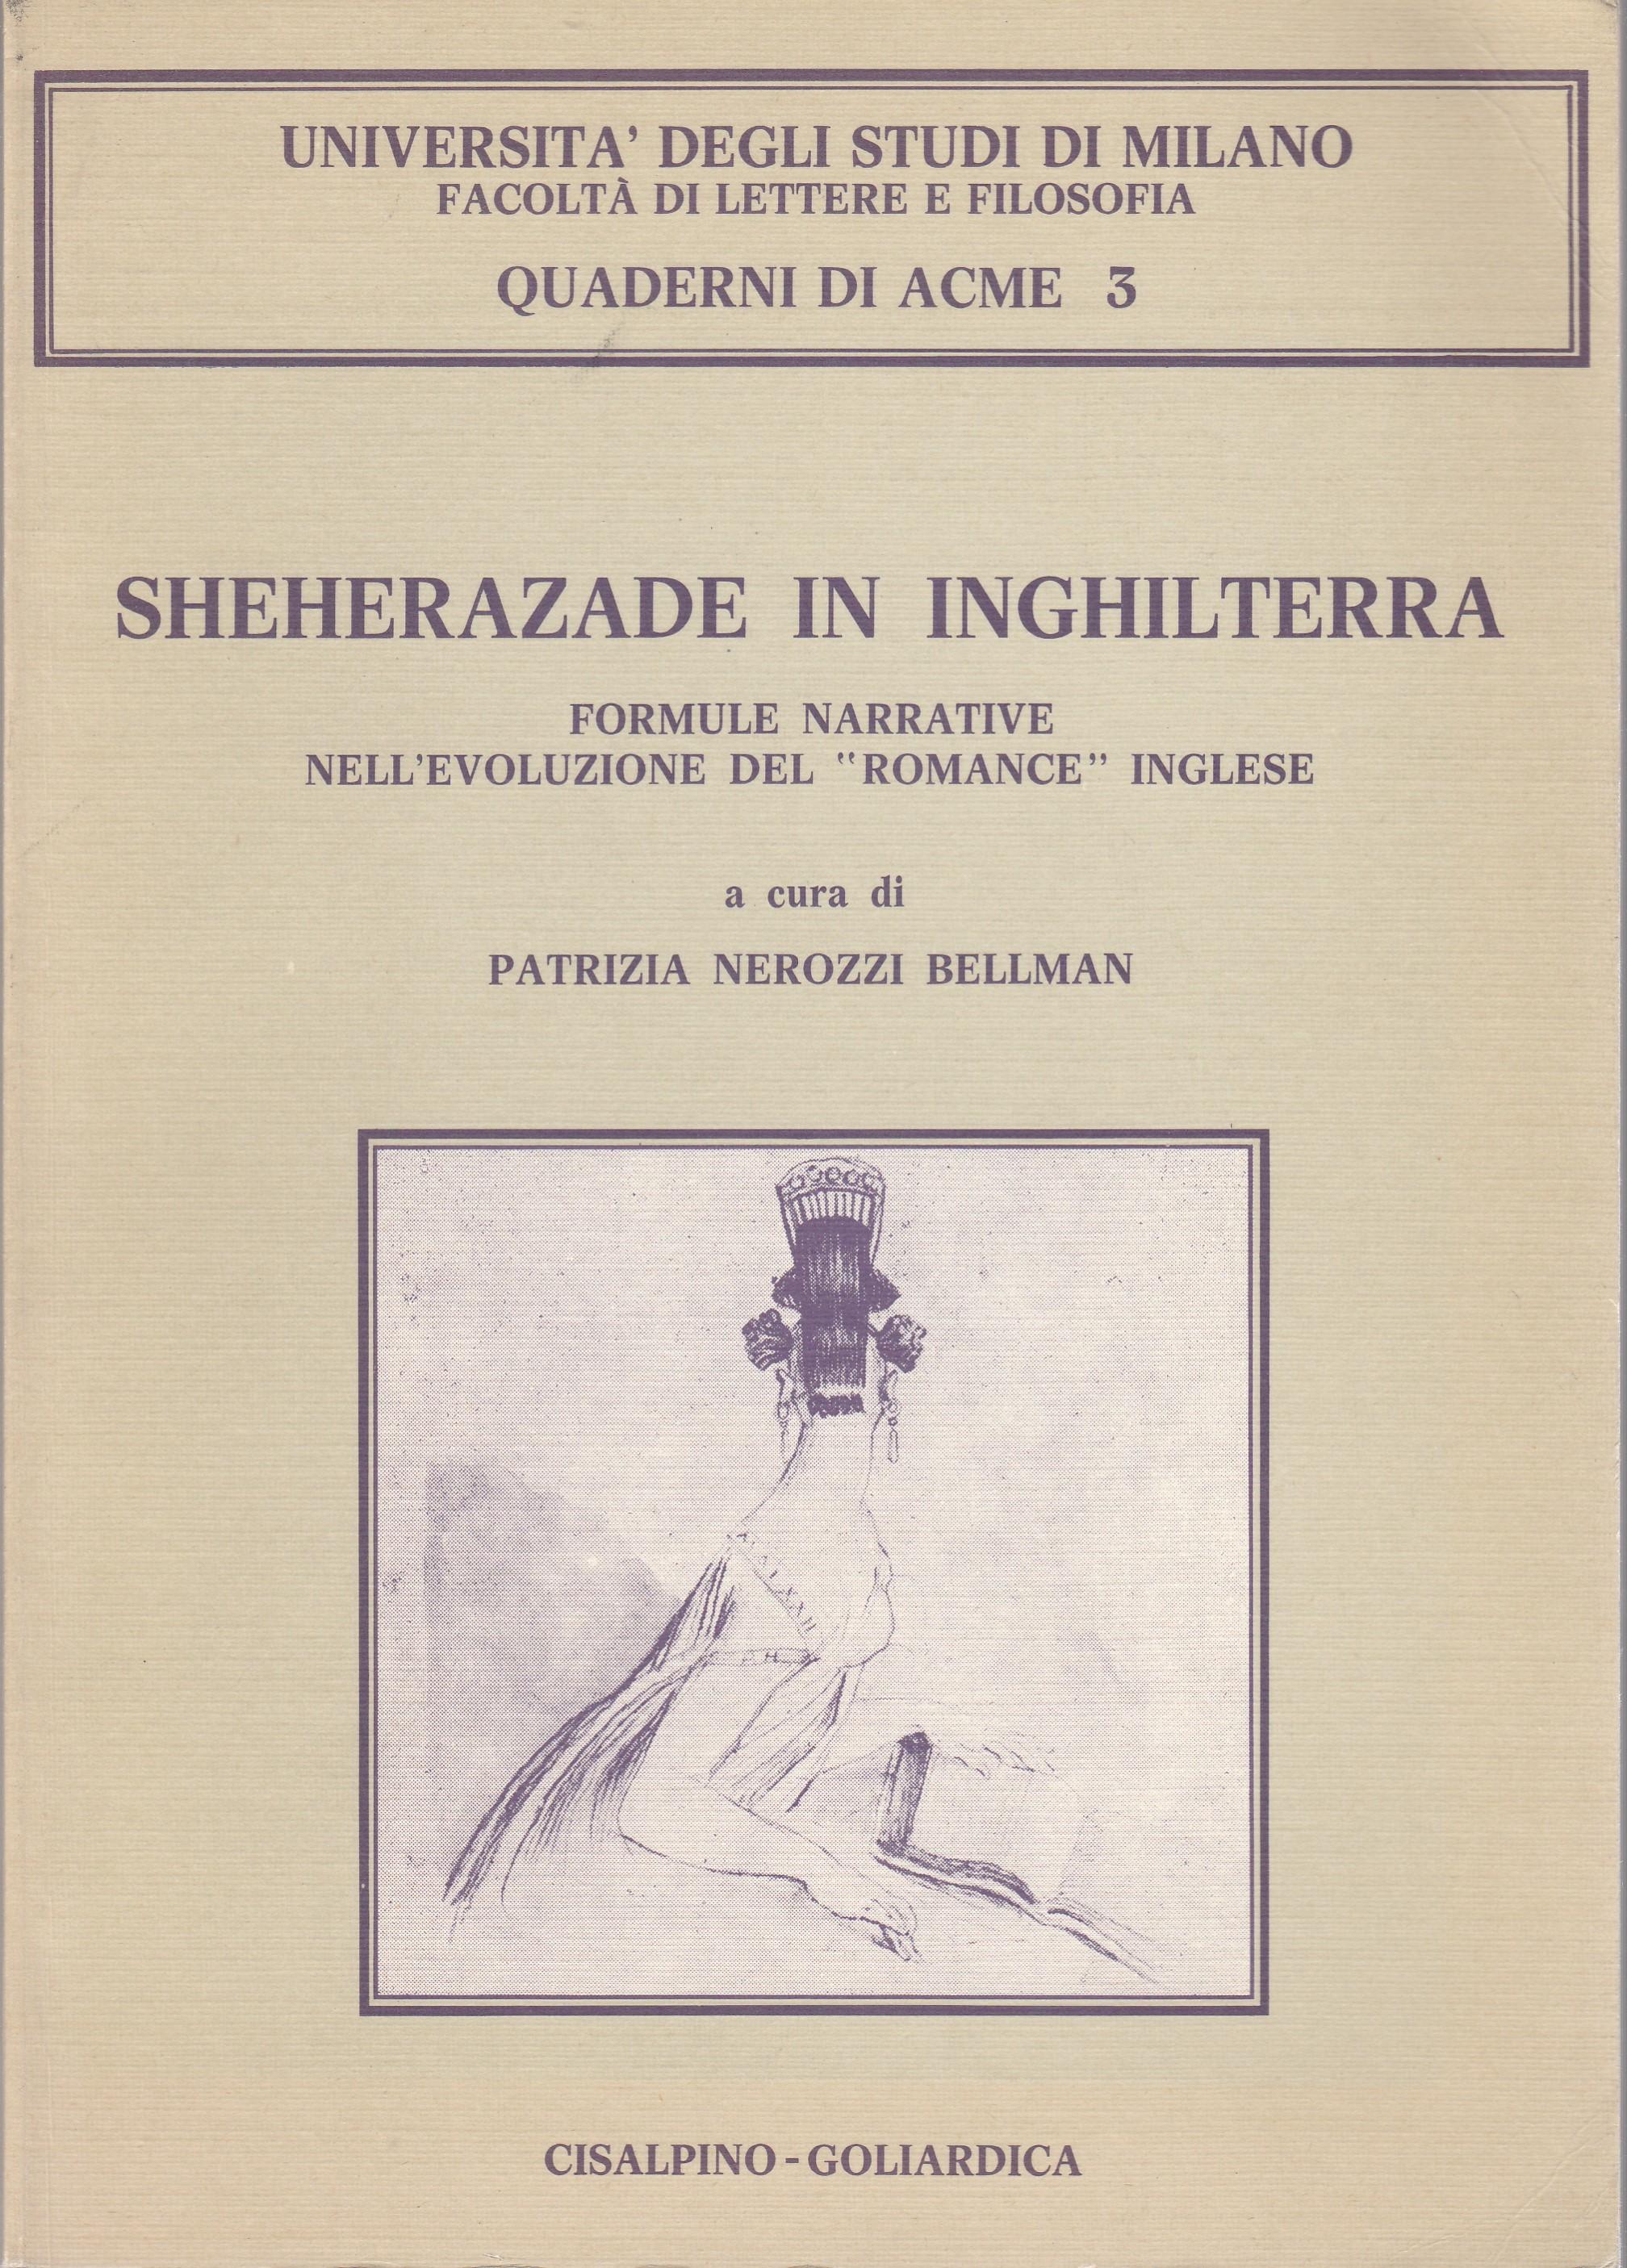 Sheherazade in Inghilterra